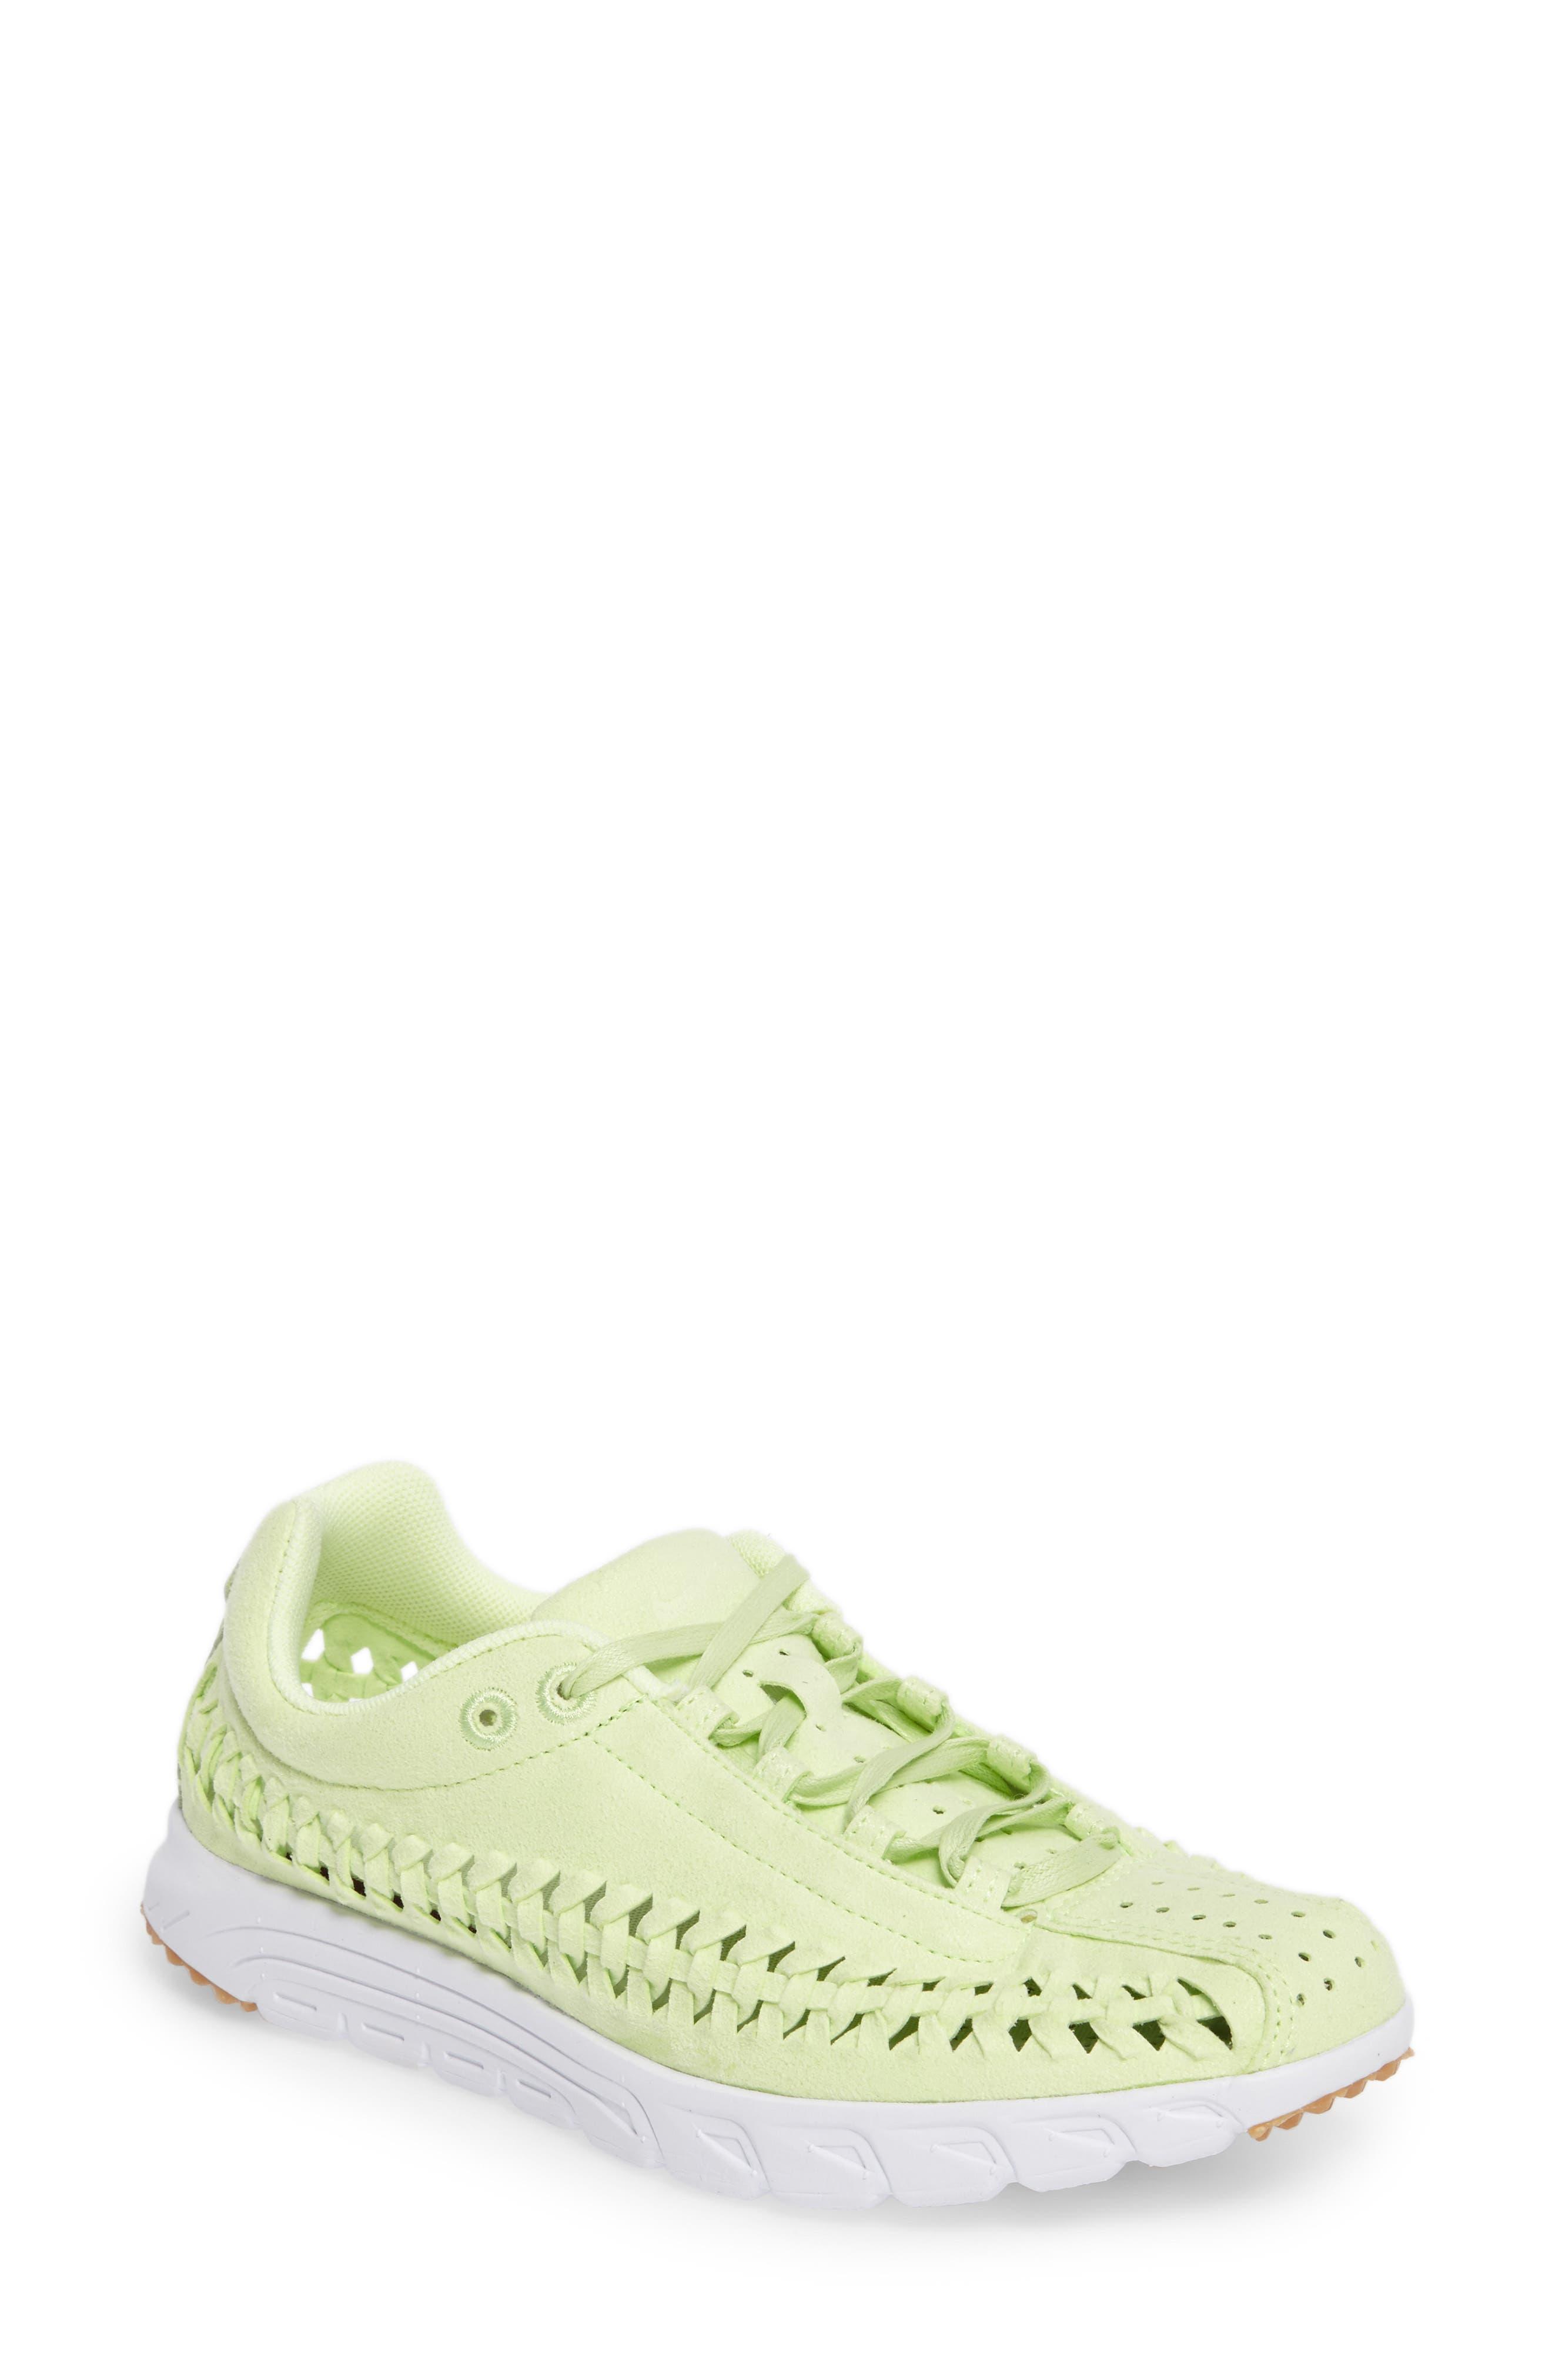 Mayfly Woven QS Sneaker,                             Main thumbnail 1, color,                             Liquid Lime/ Liquid Lime